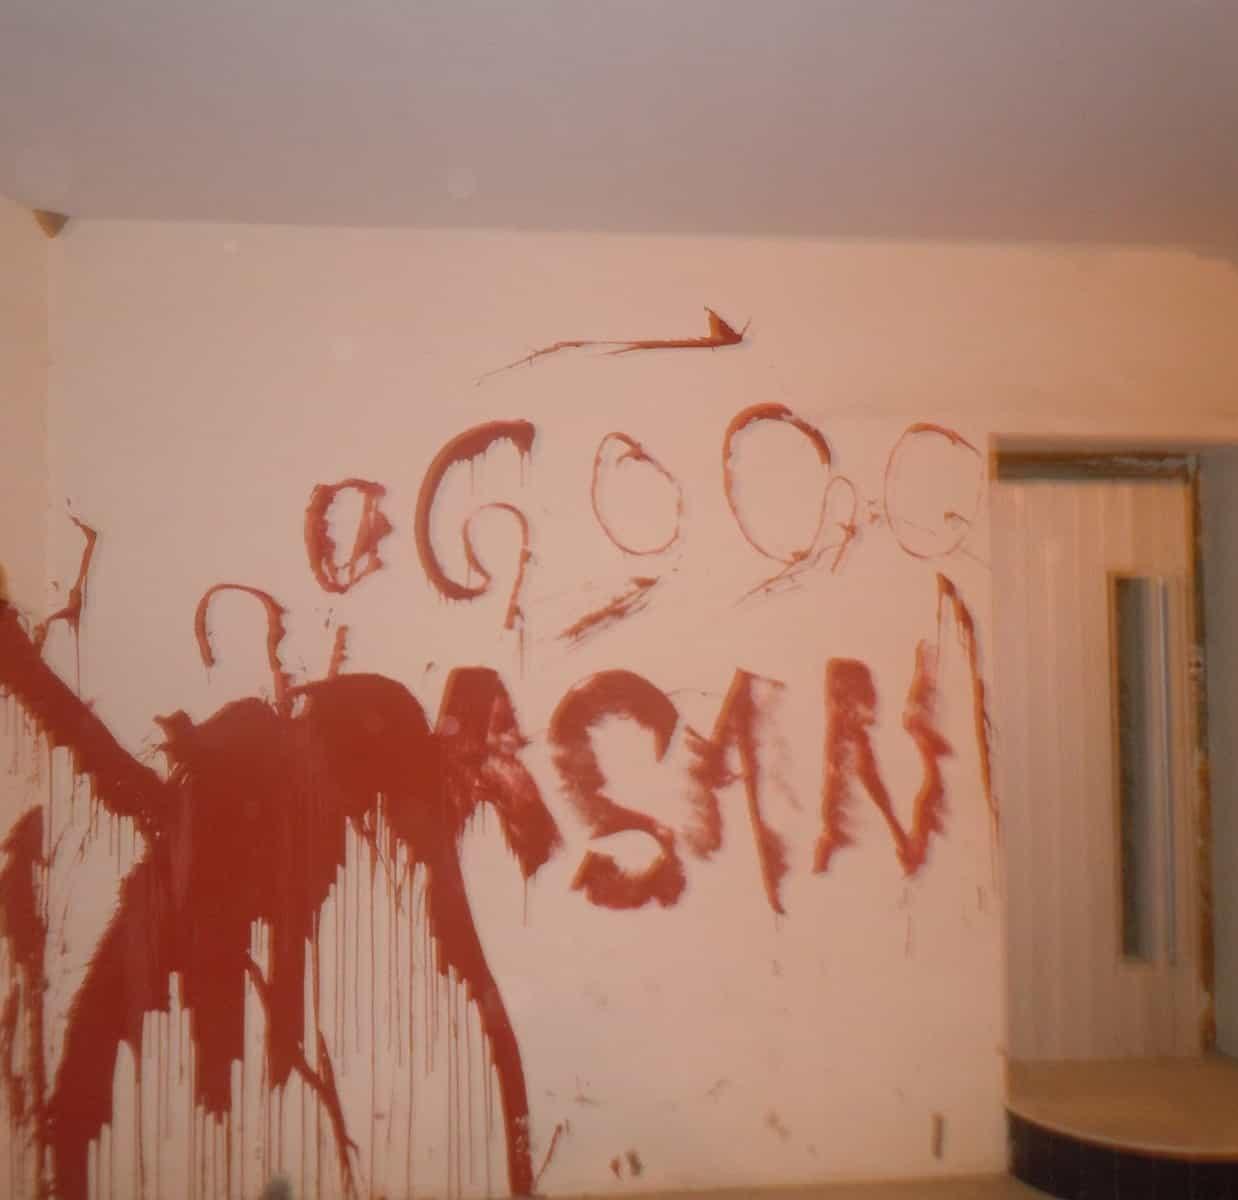 Wall blood graffiti at Qassimi Palace Ras Al Khaimah